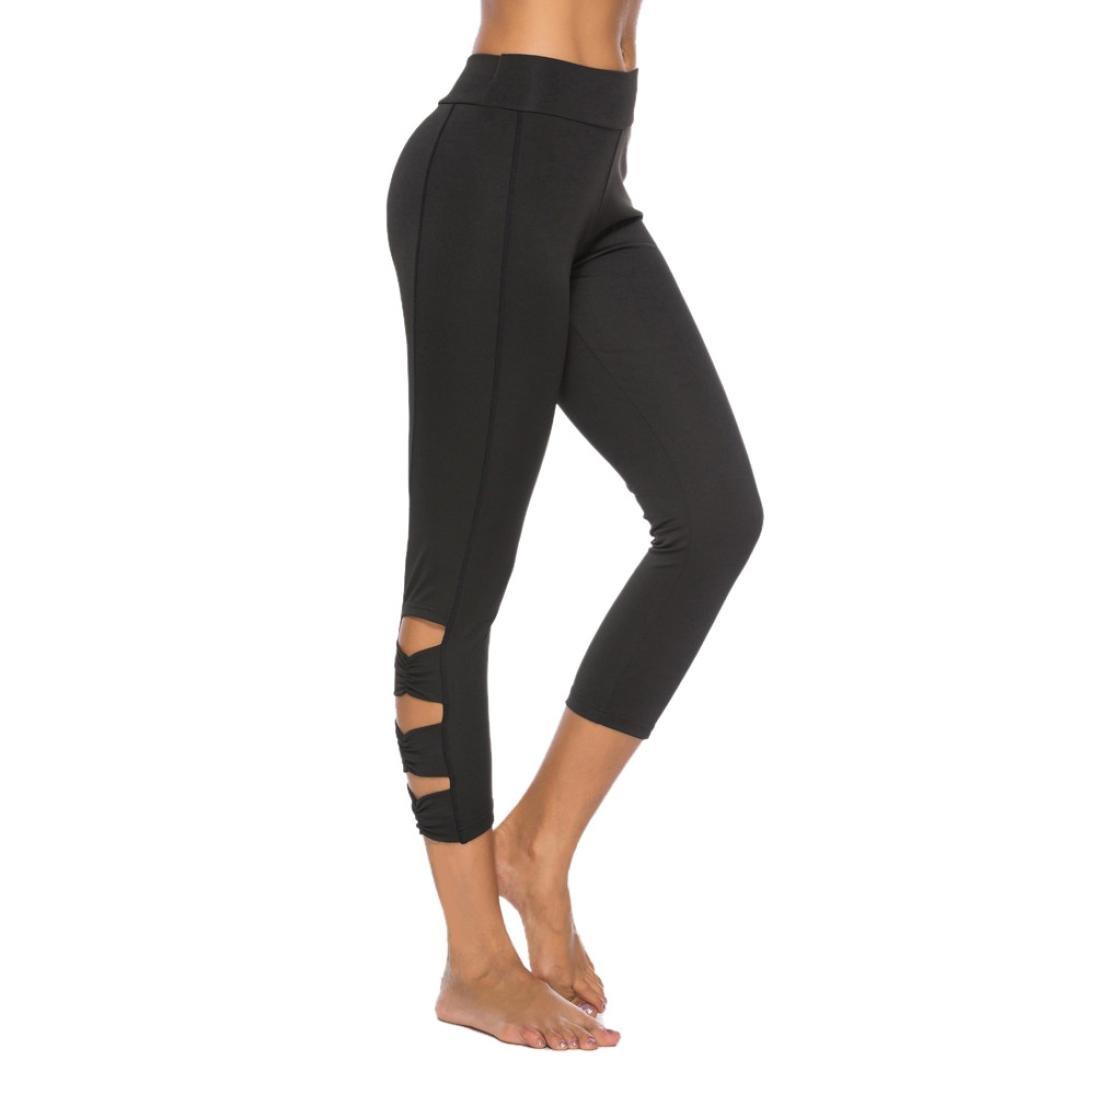 9afb862dcef63 Amazon.com: iMakcc Women Capri Yoga Pants with Pocket 3 Way Stretch  Moisture Wicking Leggings Pants: Clothing